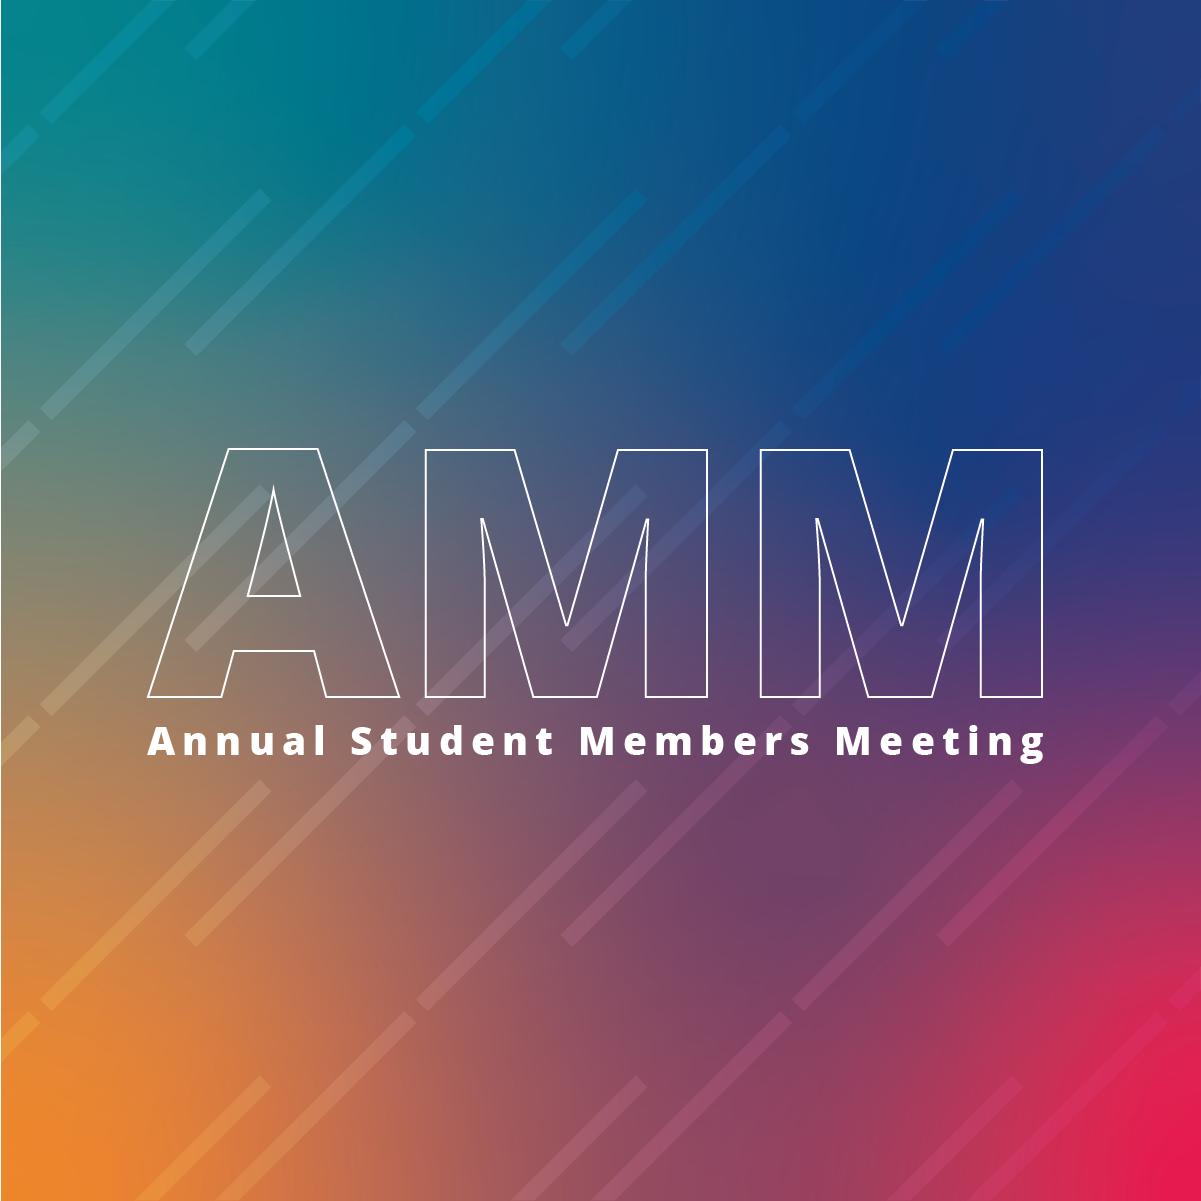 Annual Student Members Meeting